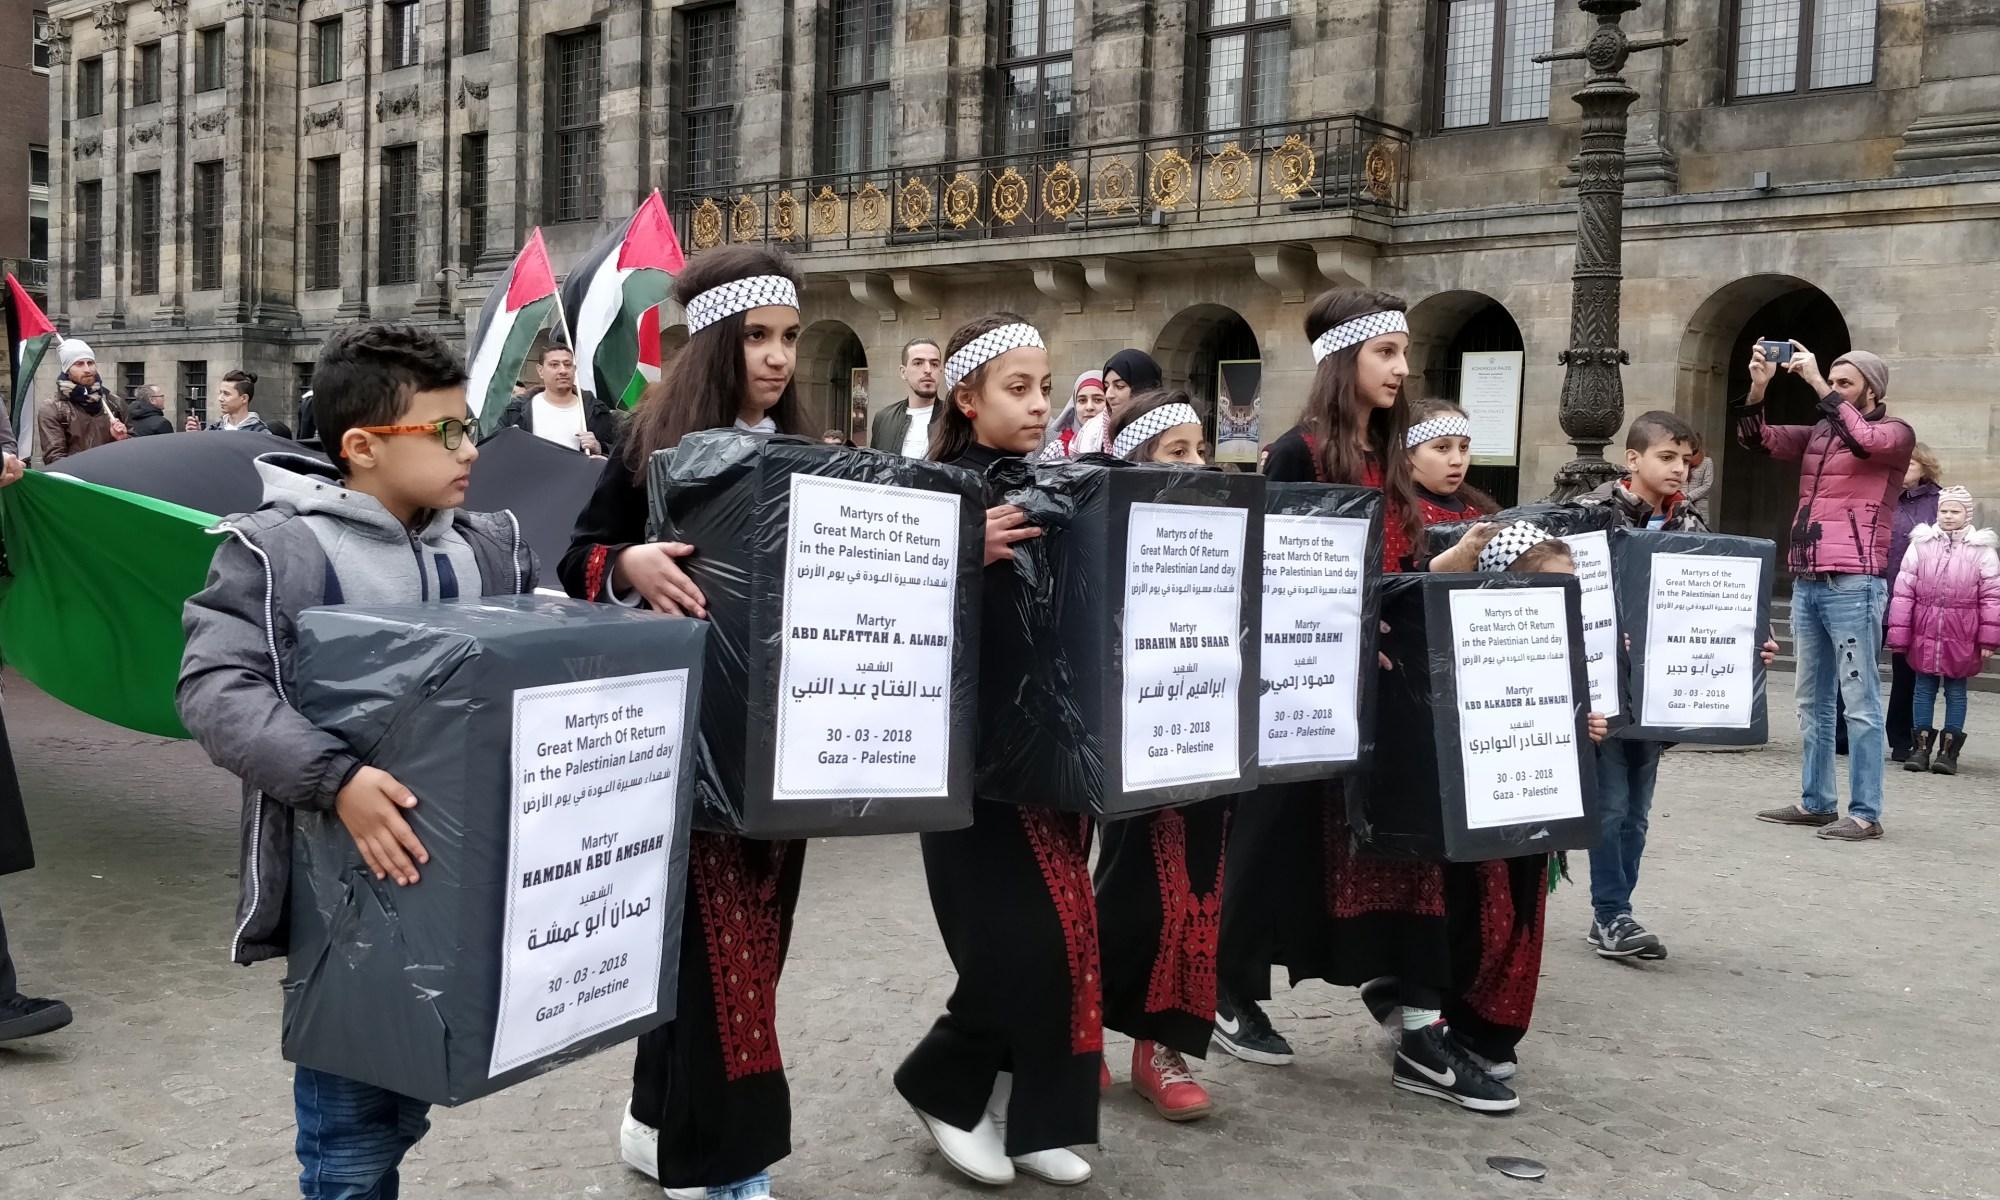 Landdagmanifestatie Amsterdam 31 maart 2018